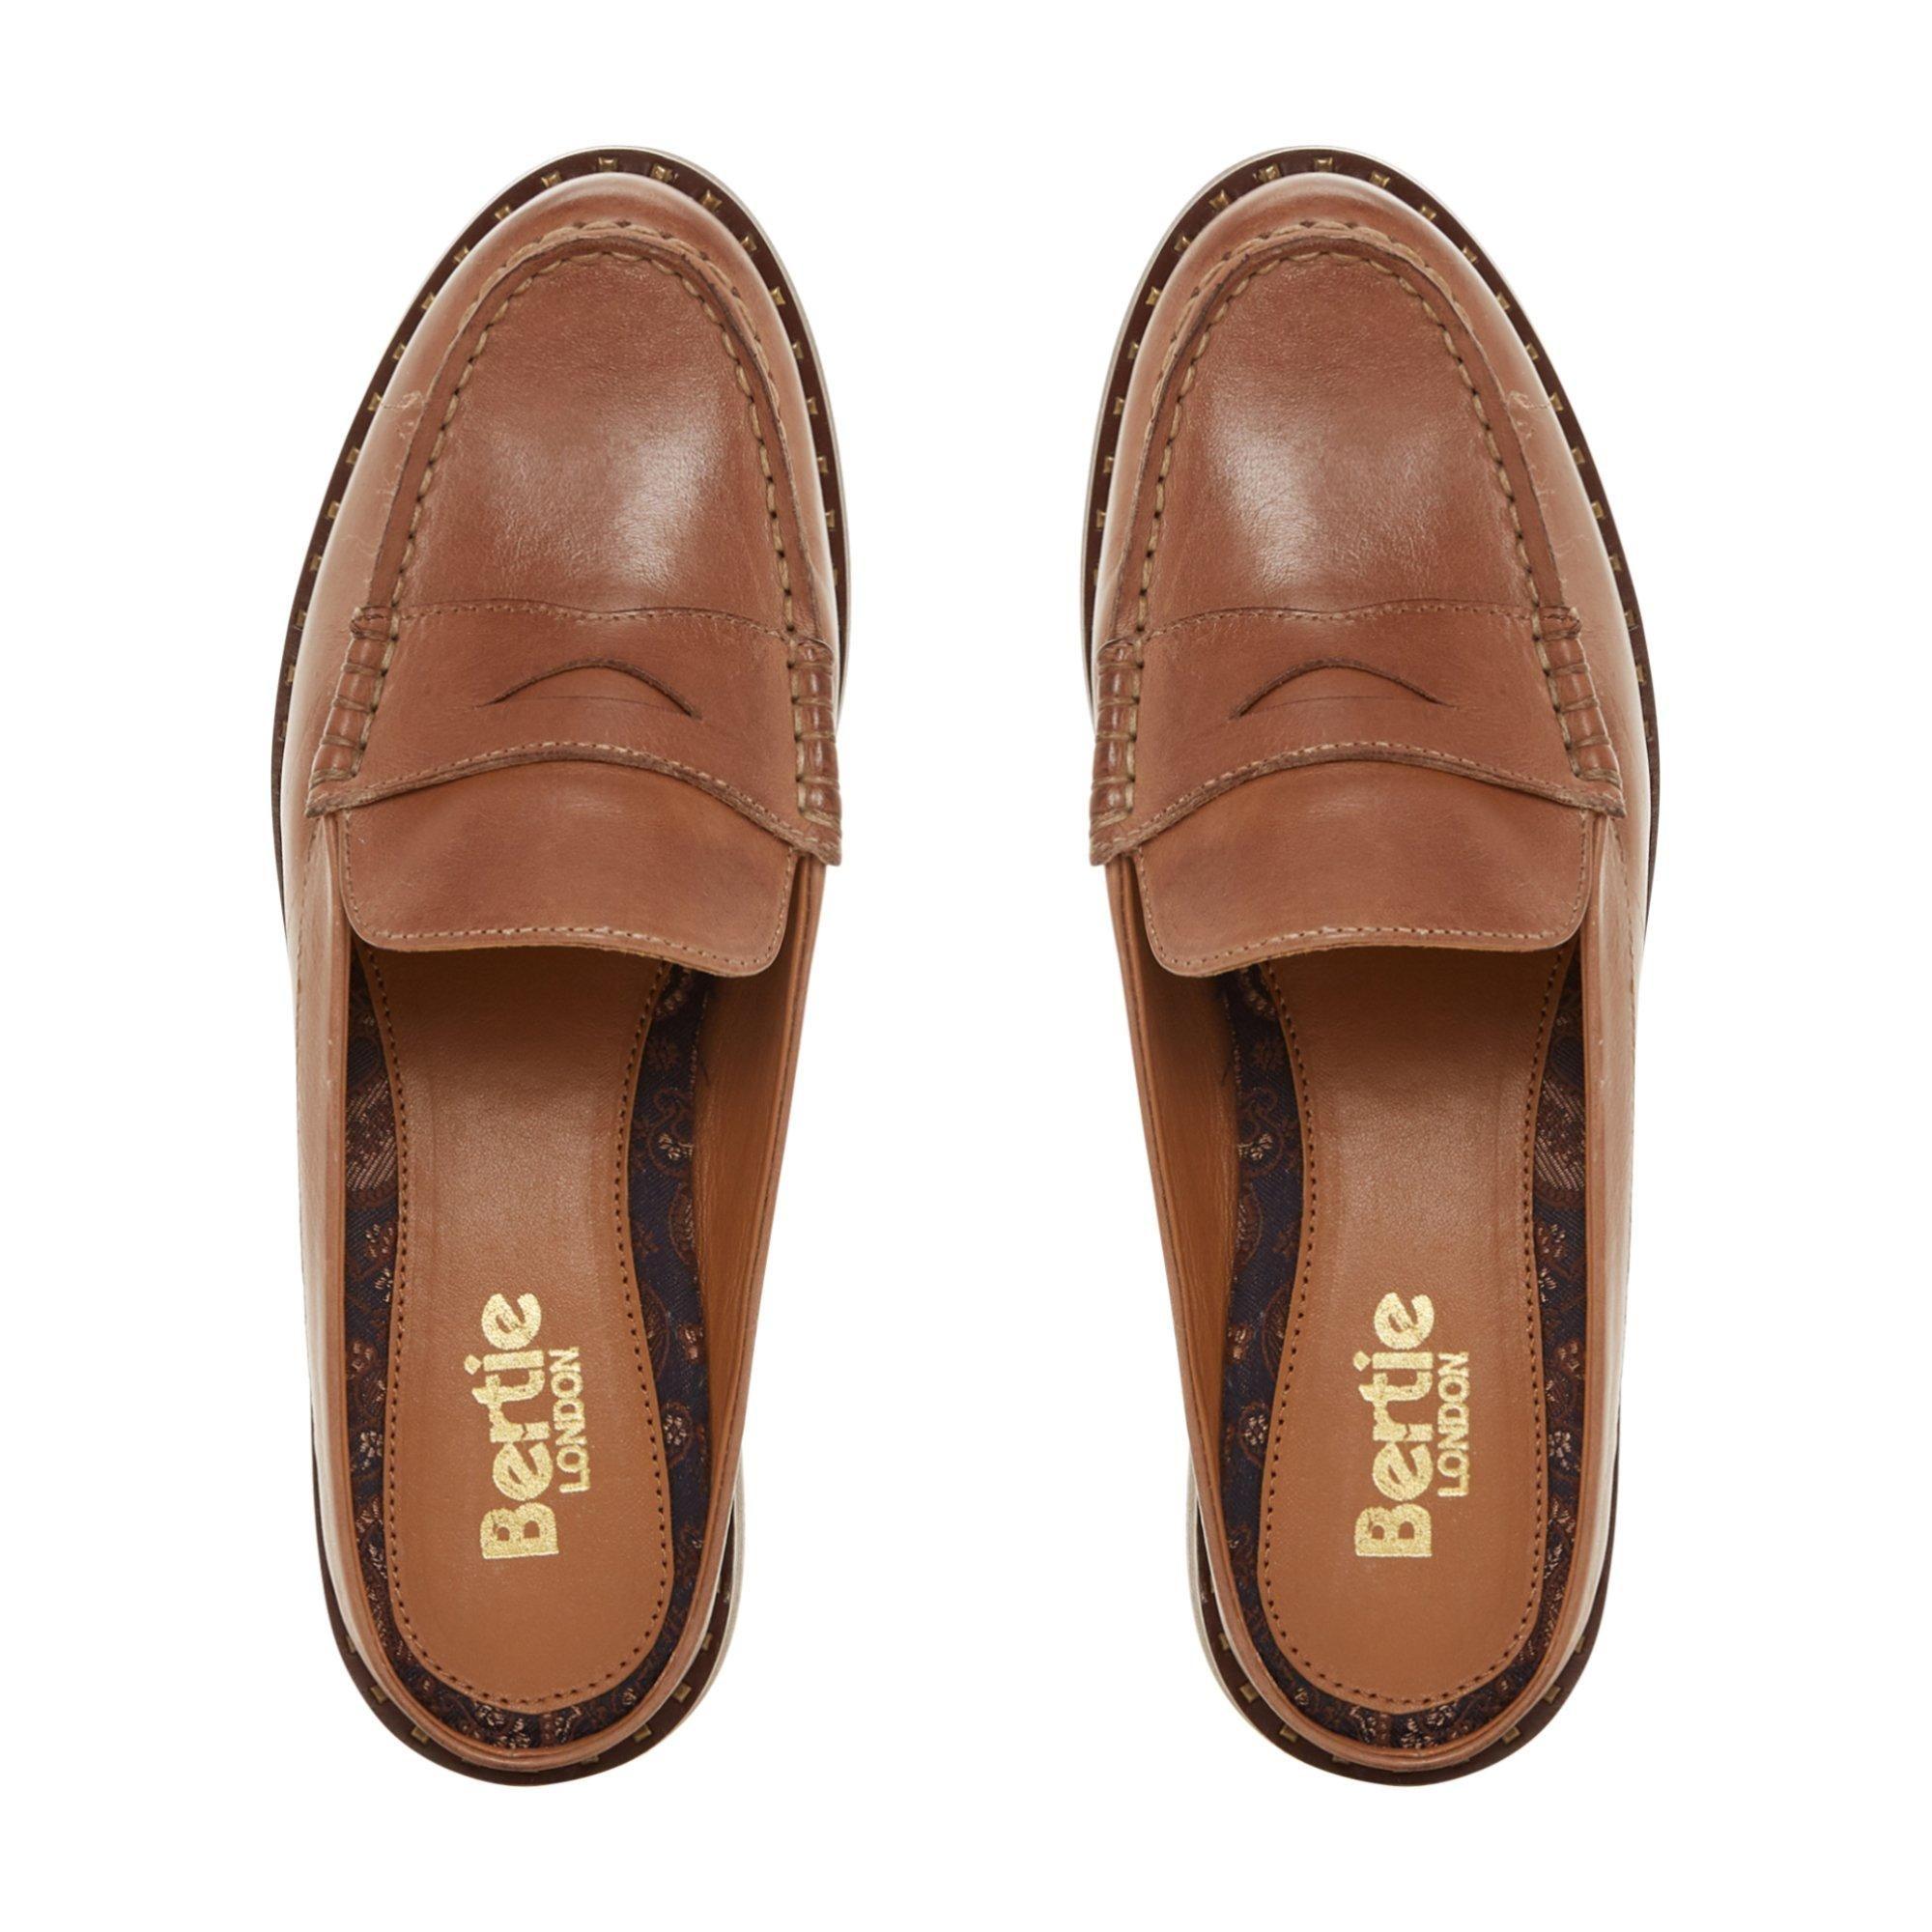 Bertie Ladies GREENLAND Leather Mule Loafer